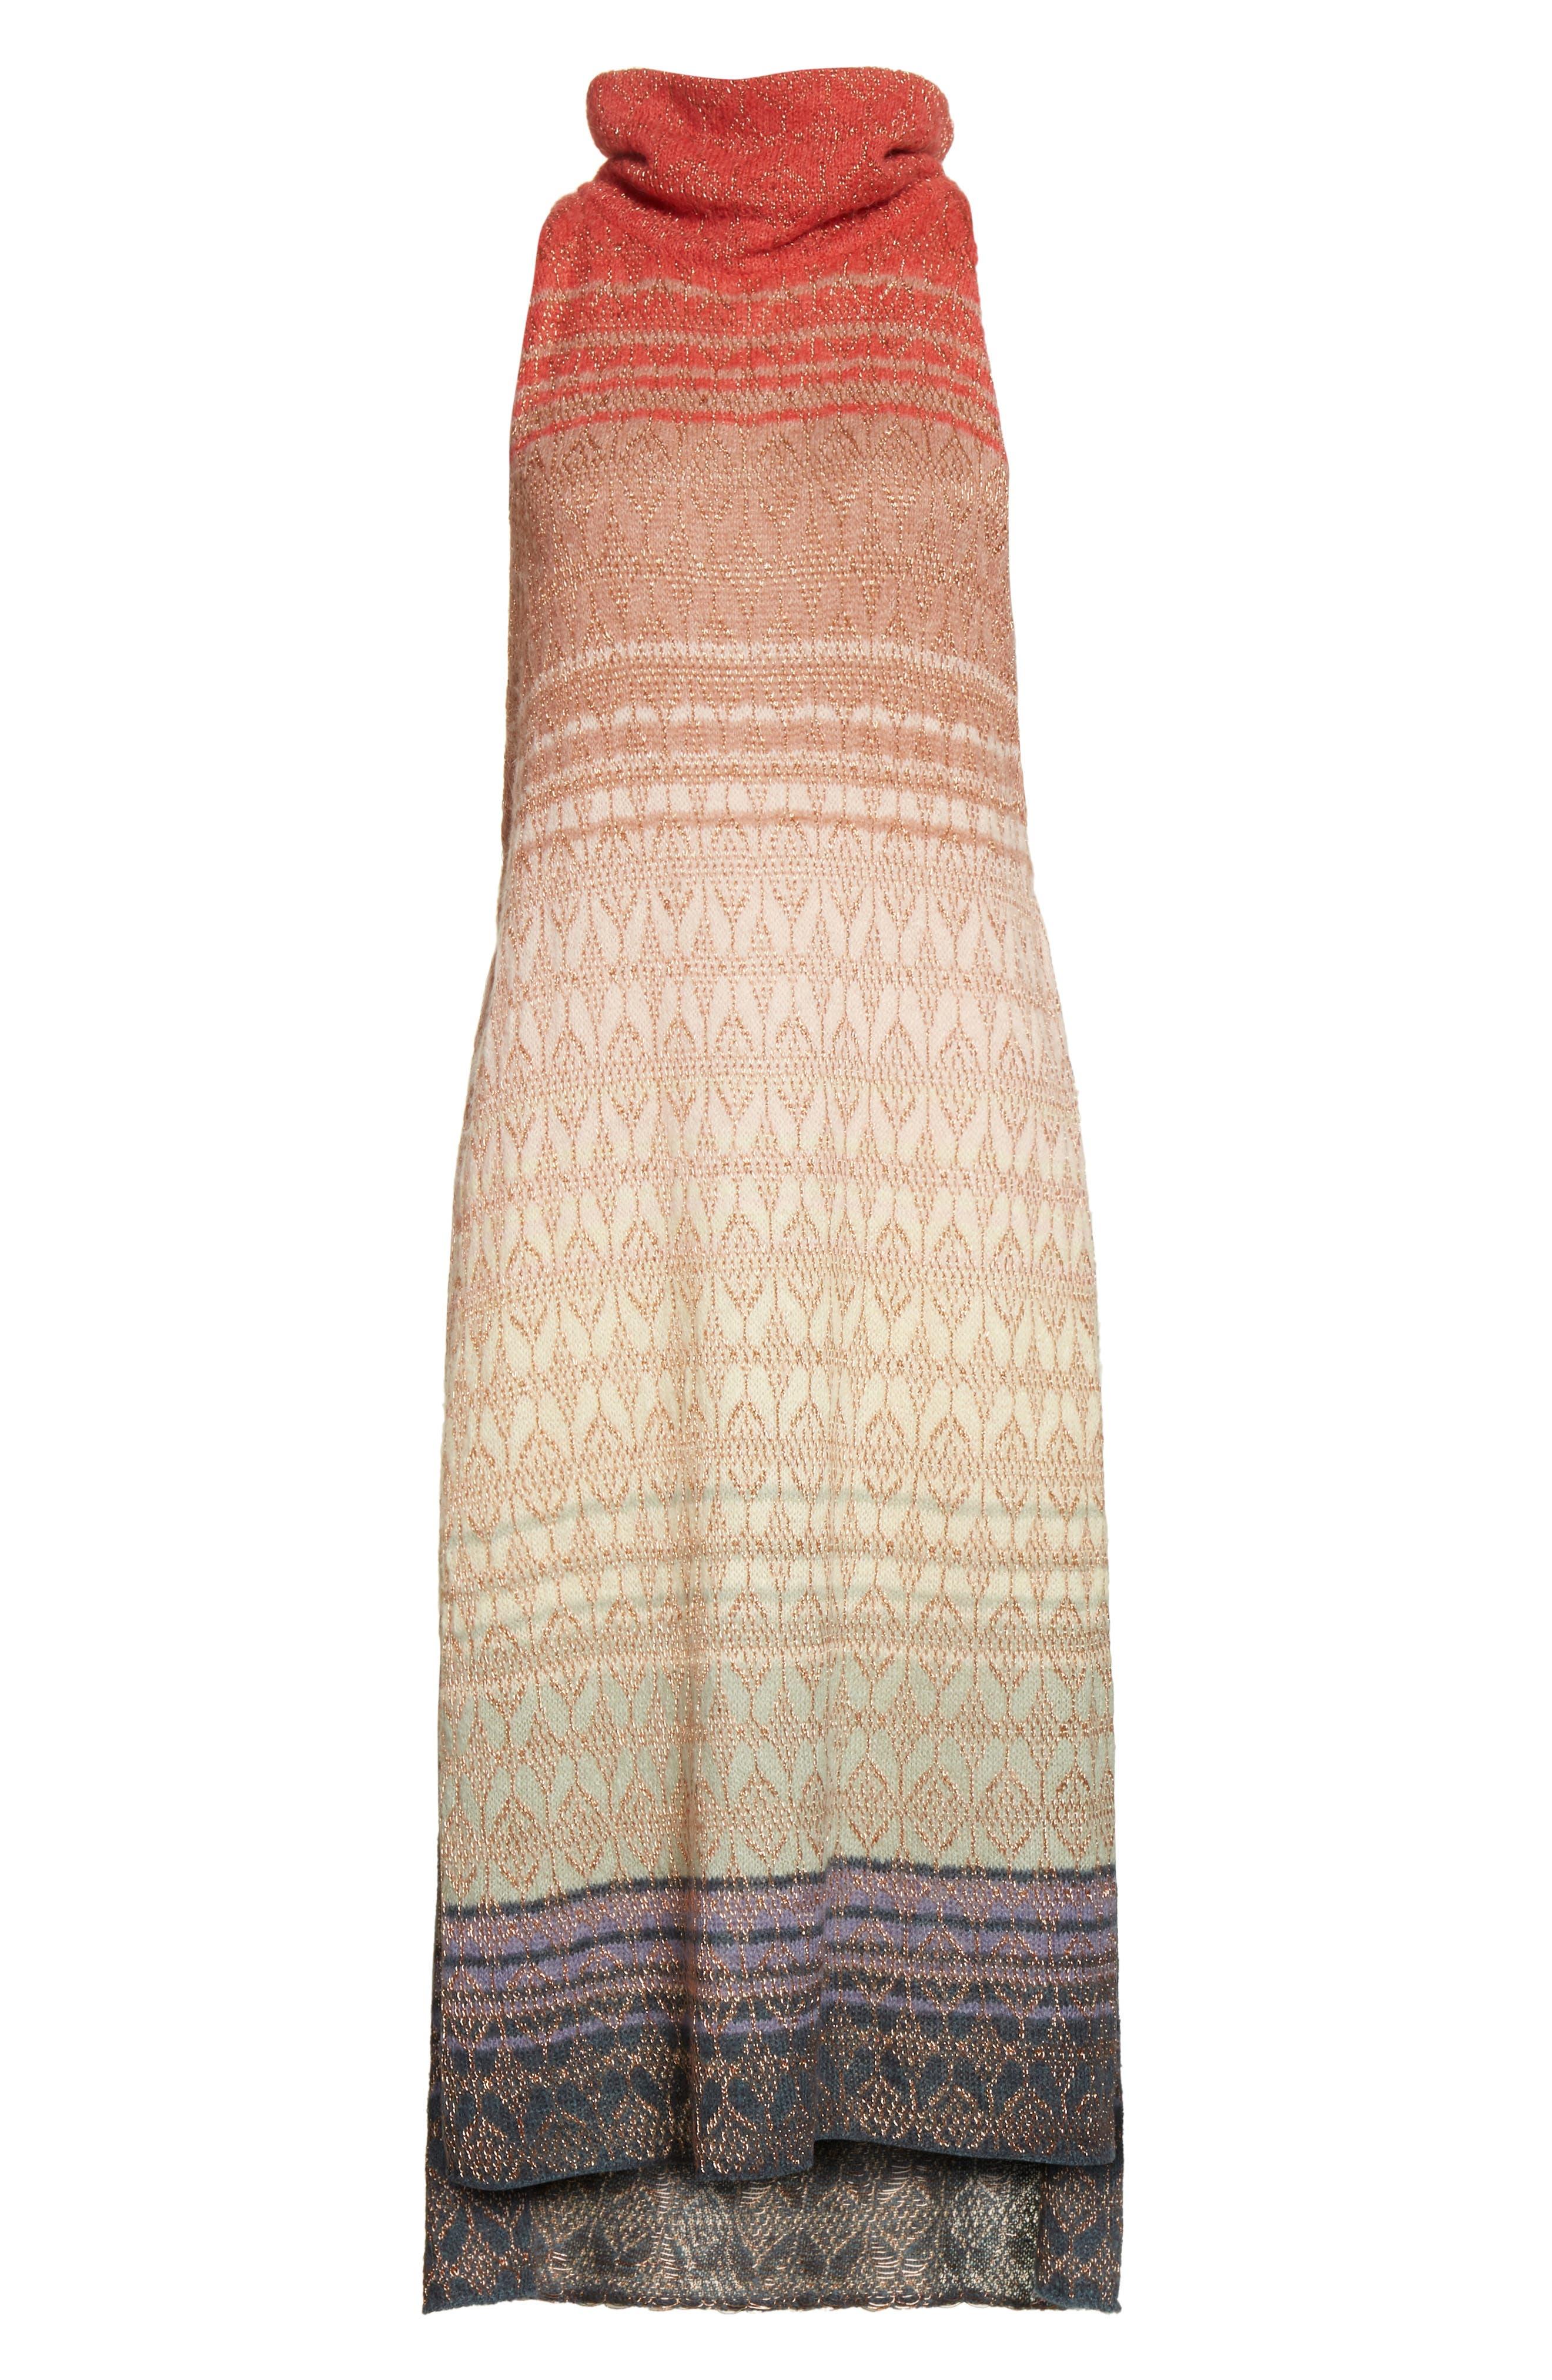 Rainbow Tunic Dress,                             Alternate thumbnail 6, color,                             907